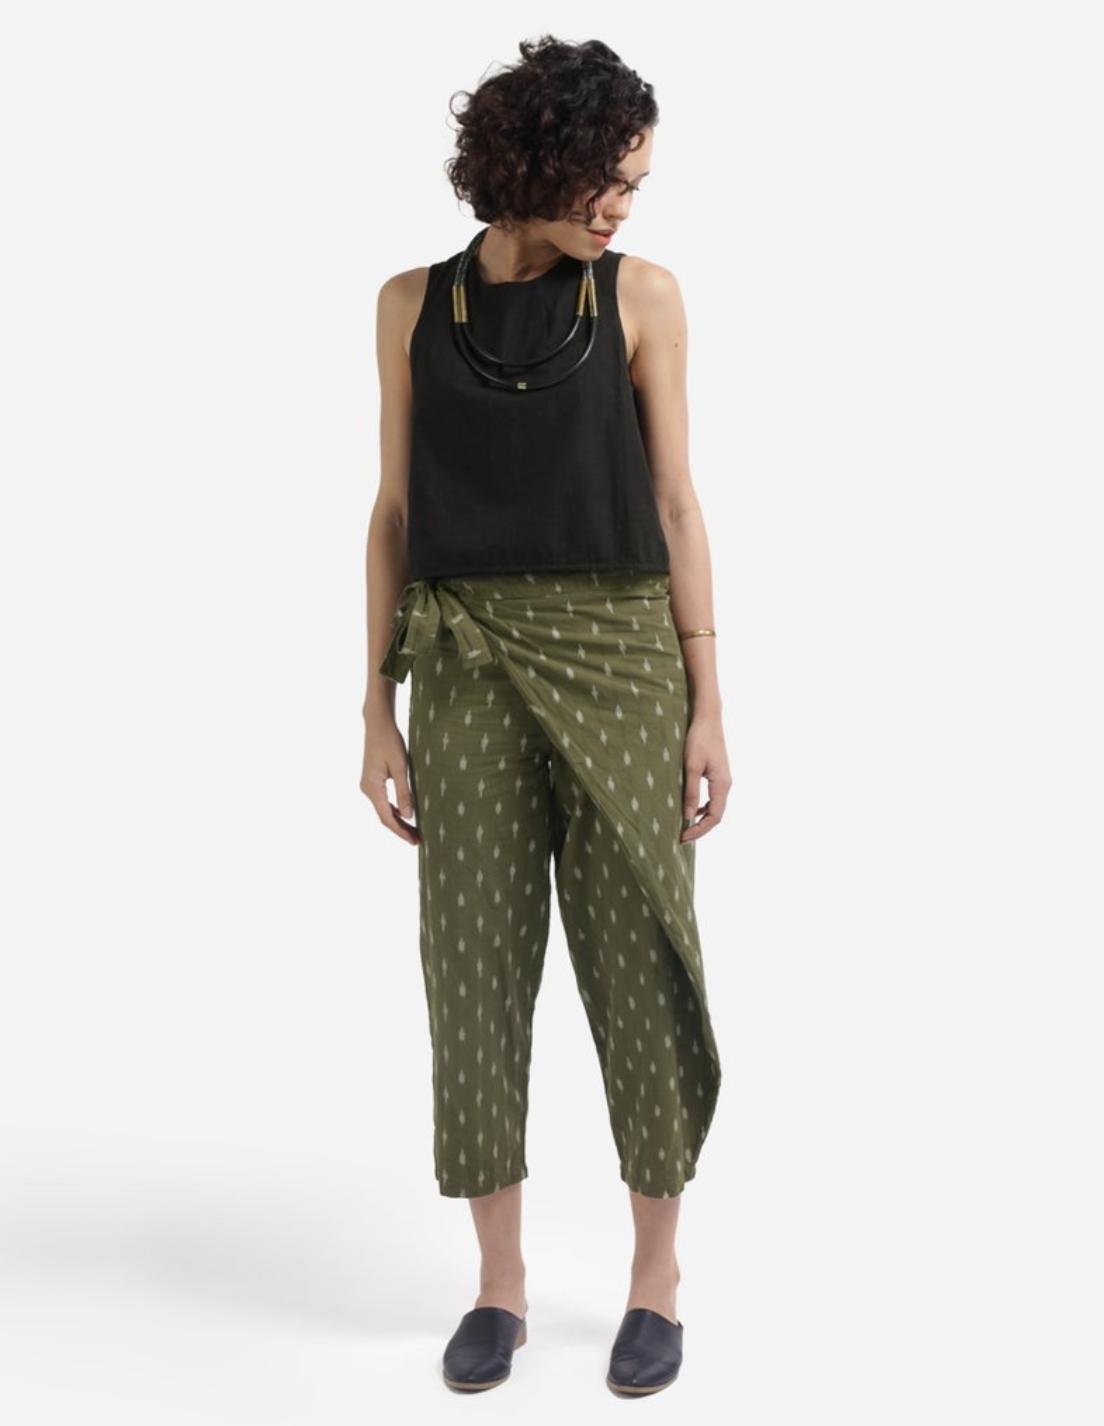 keiramason_ethicalworkwear_matterprints_pants.png